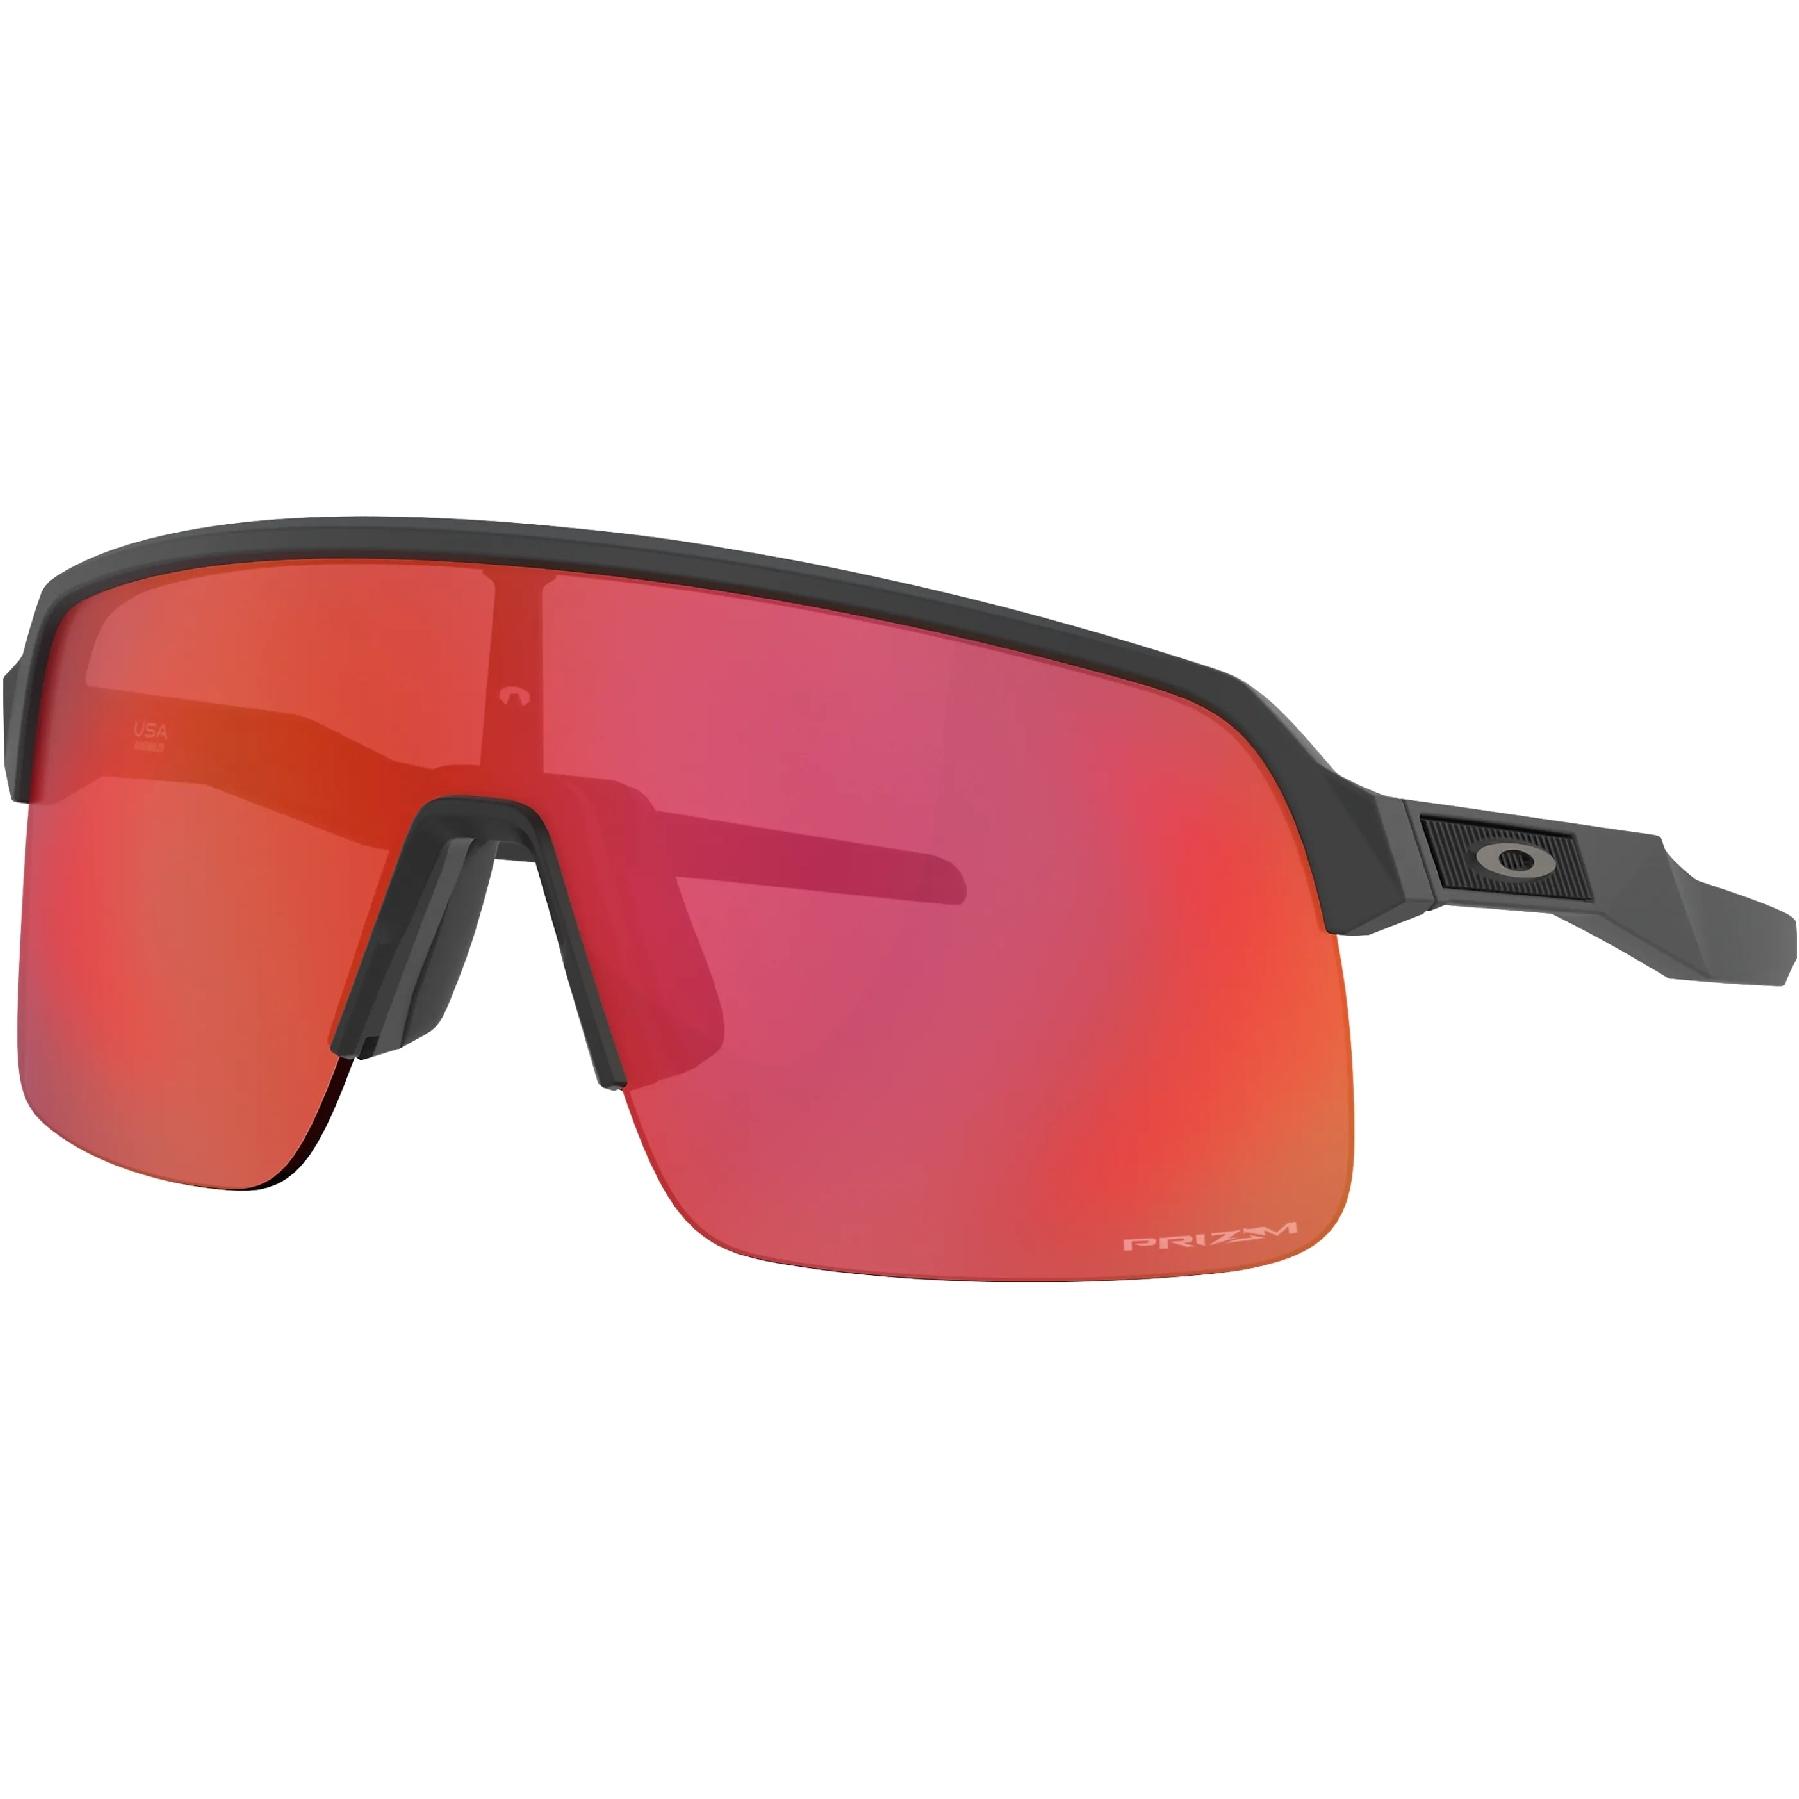 Foto de Oakley Sutro Lite Gafas - Matte Carbon/Prizm Trail Torch - OO9463-0439